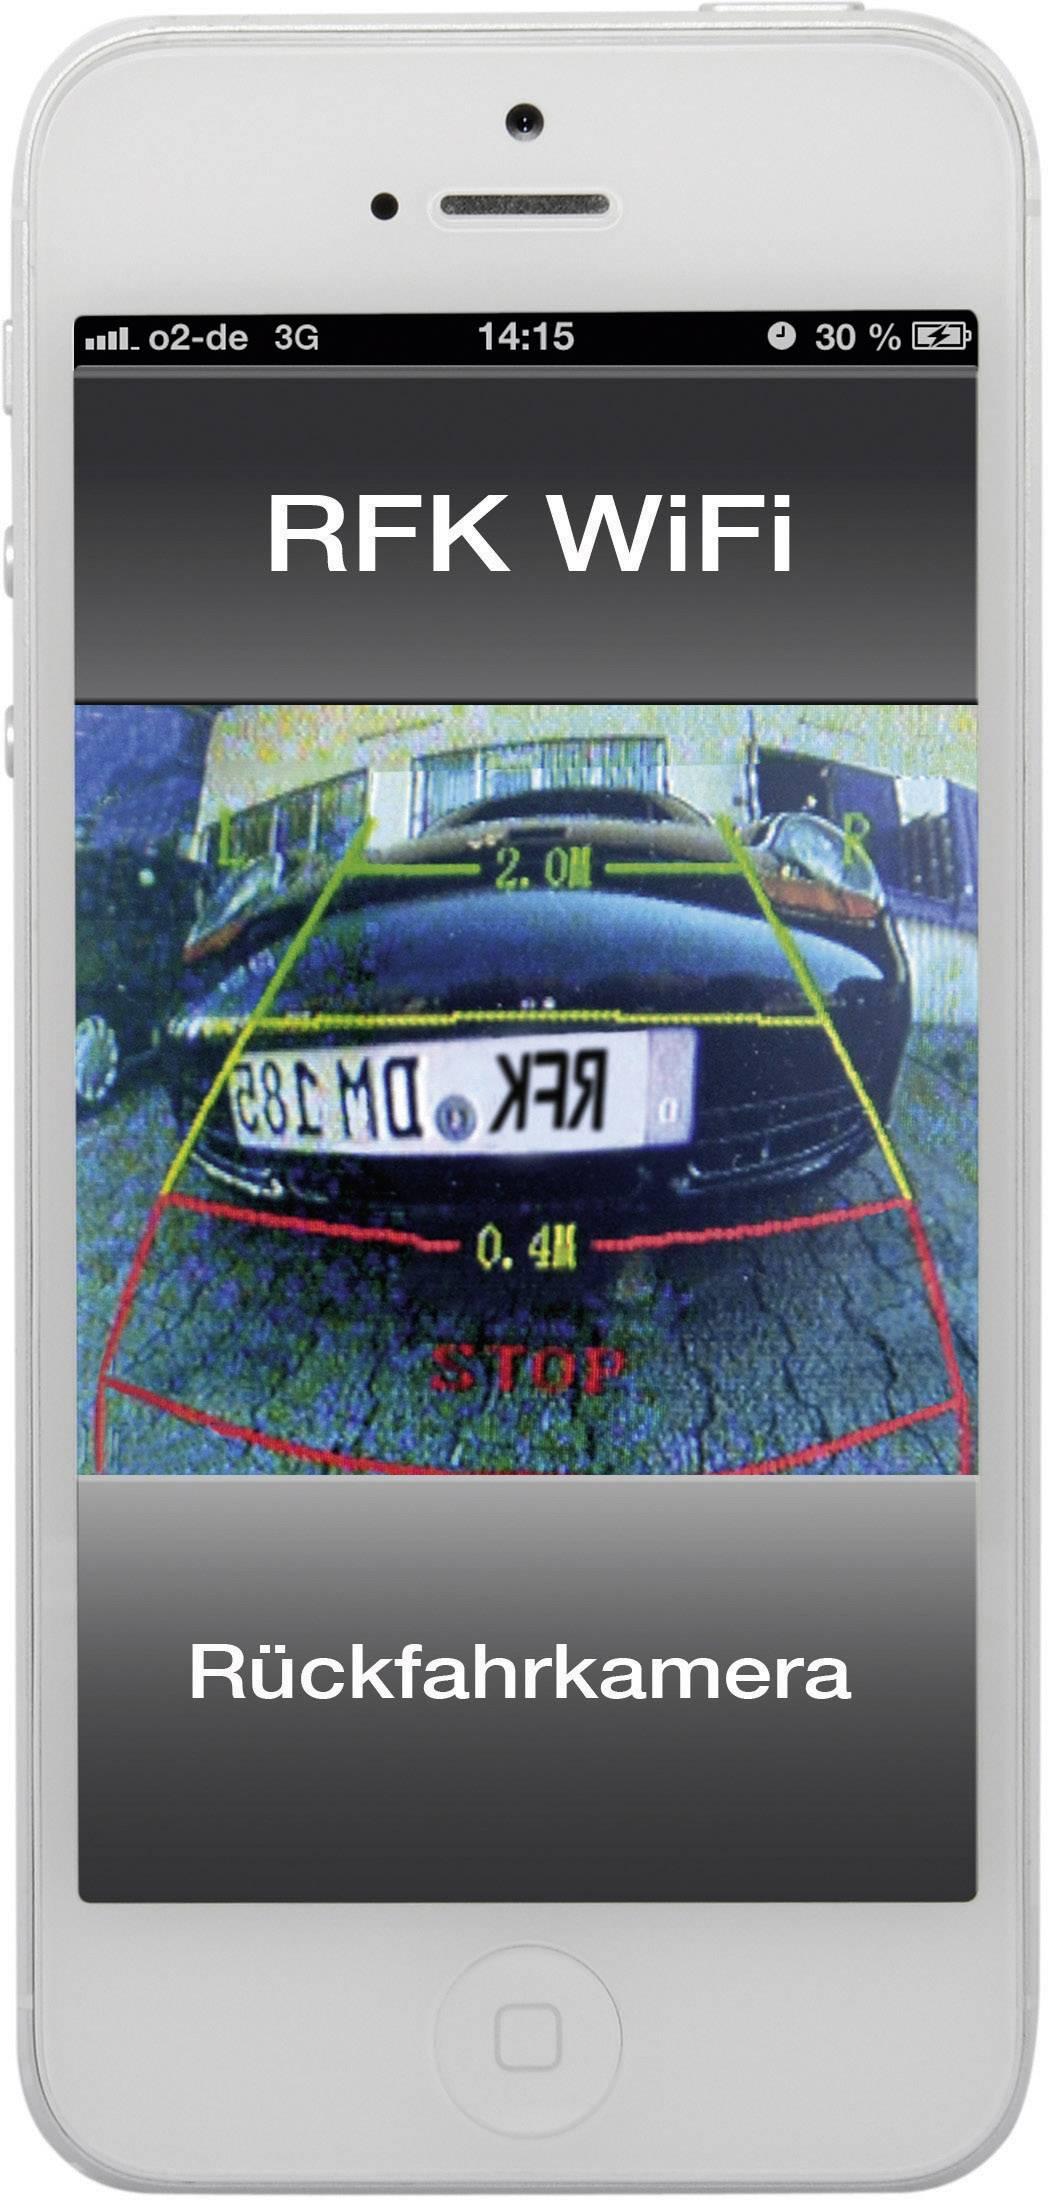 WiFi achteruitrijcamera systeem dnt RFK WiFi Extra IR-verlichting ...